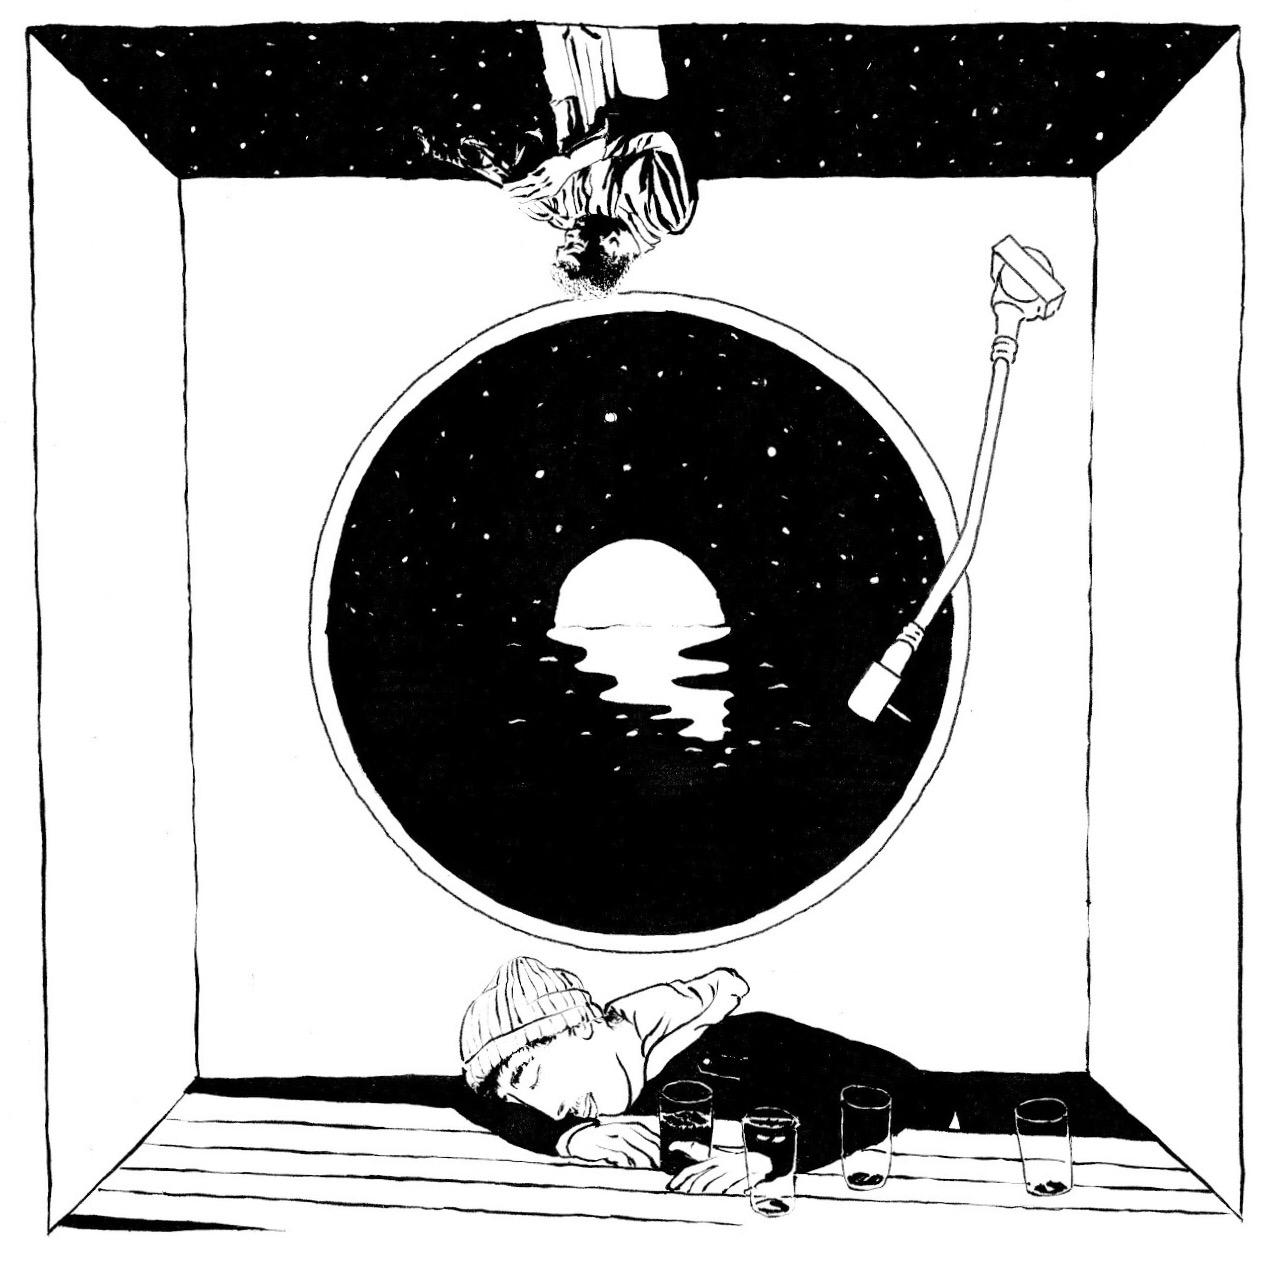 artwork by Marco Zavala